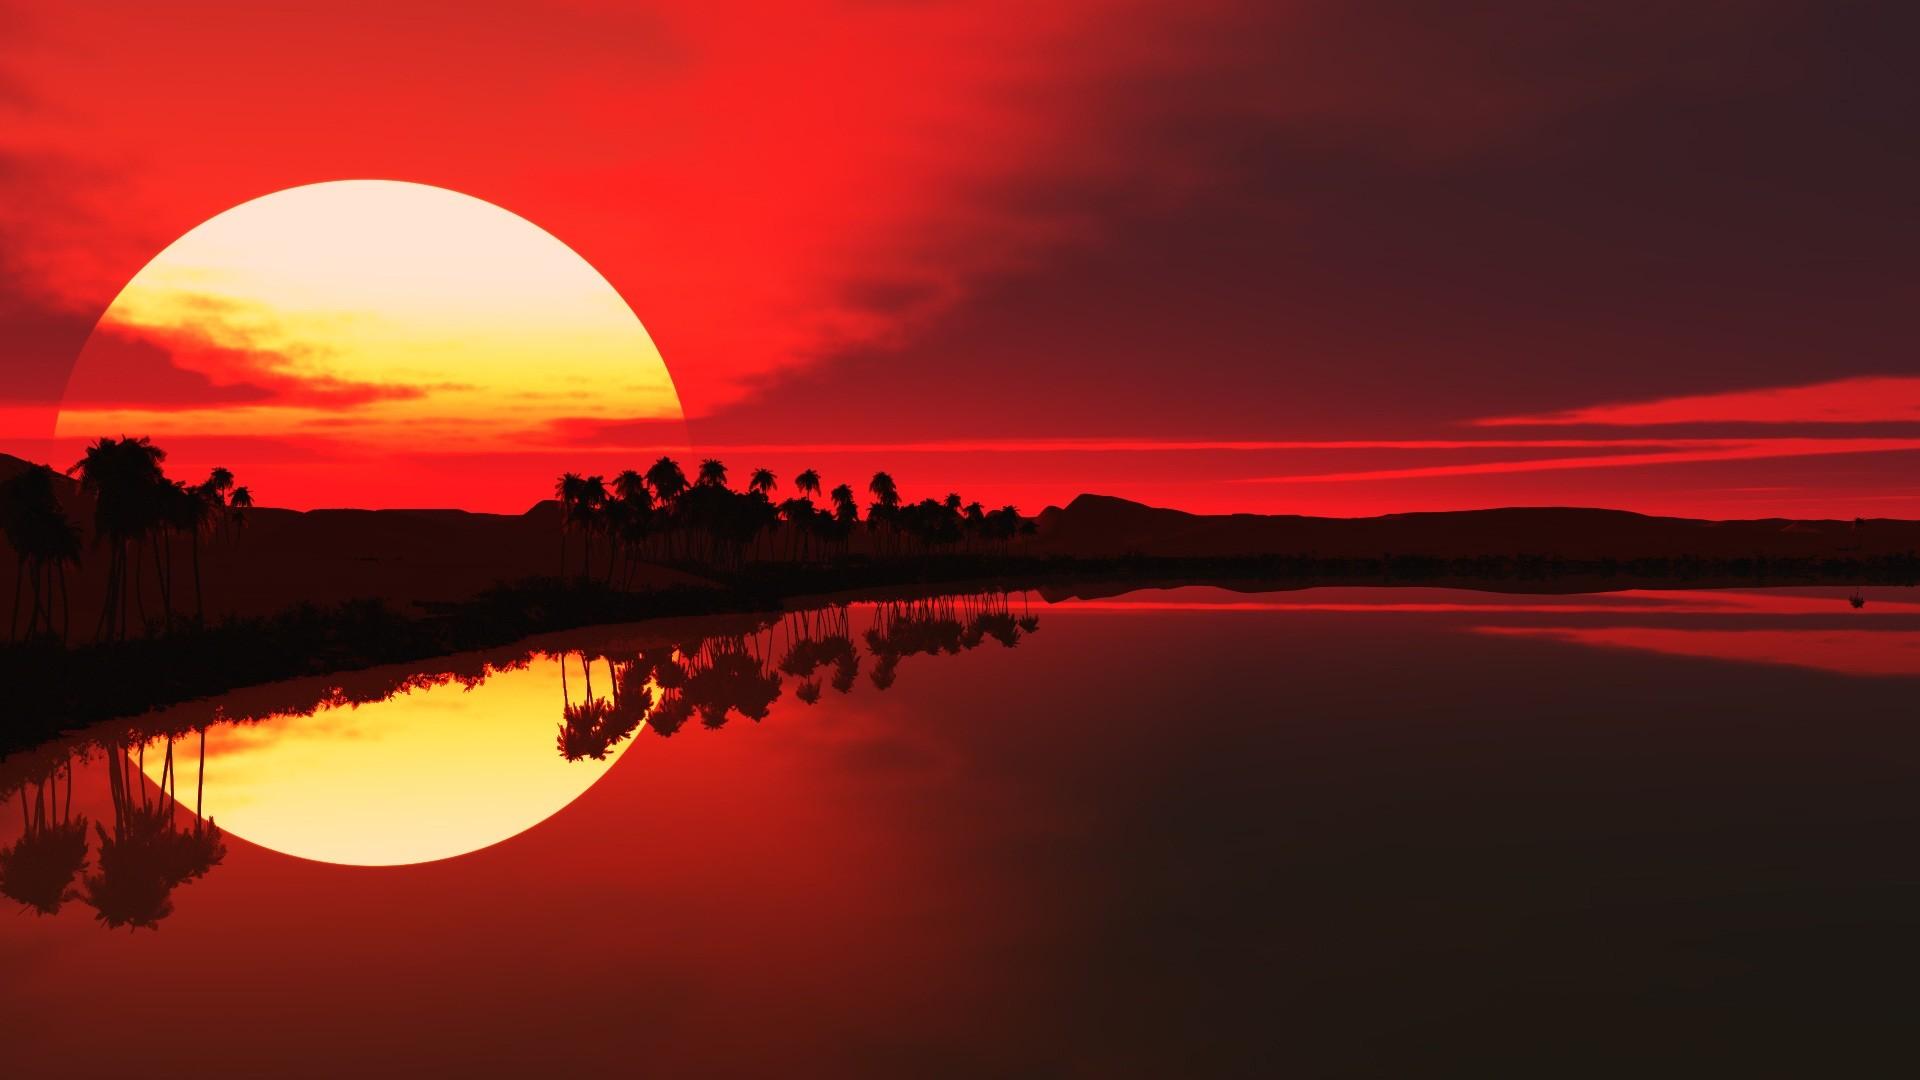 Hd Sunset Wallpaper (72+ Images